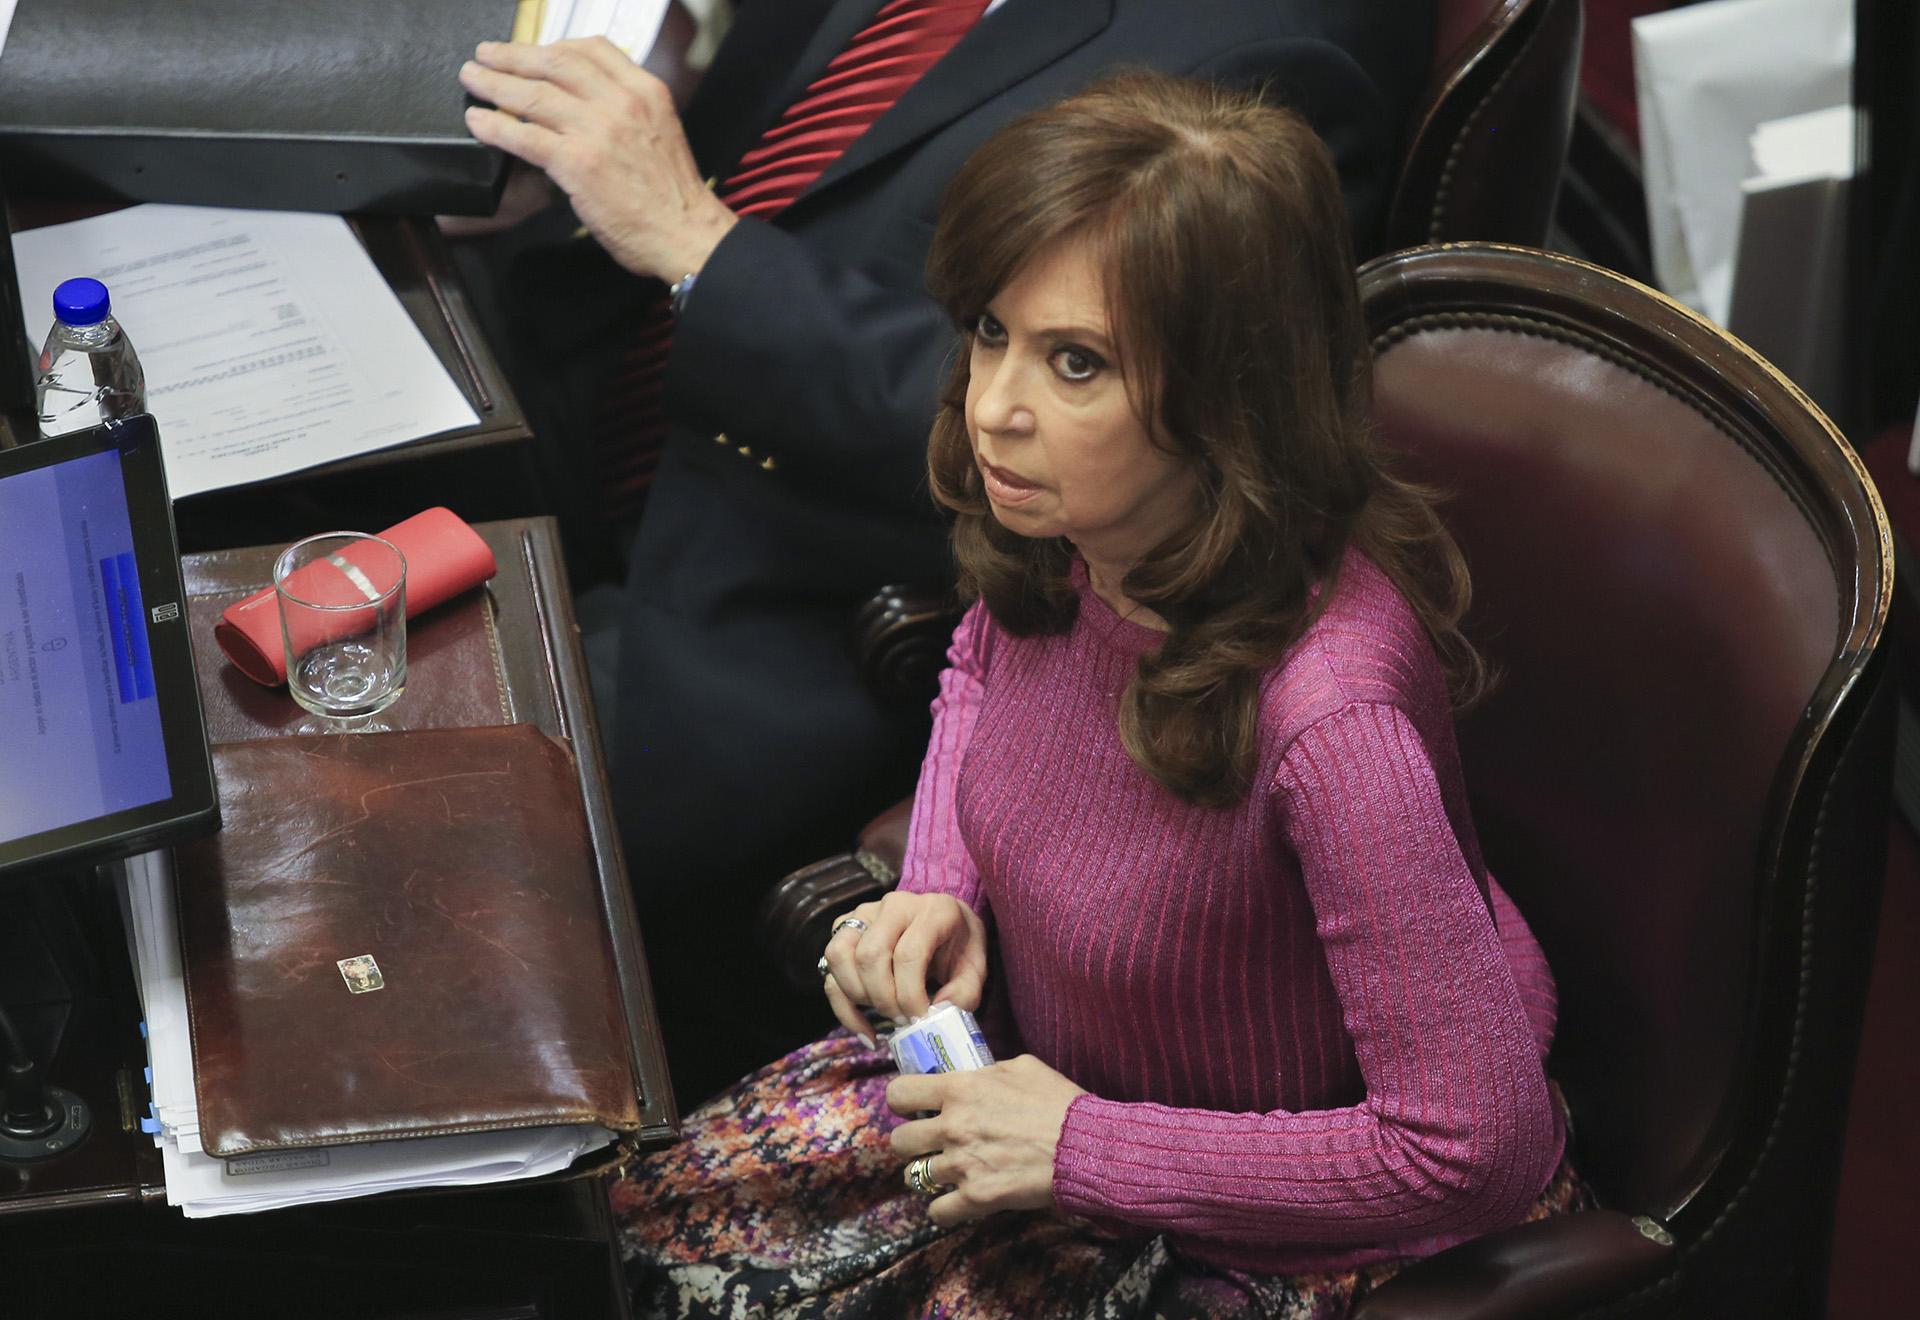 La senadora Cristina Kirchner durante el debate de la Cámara alta